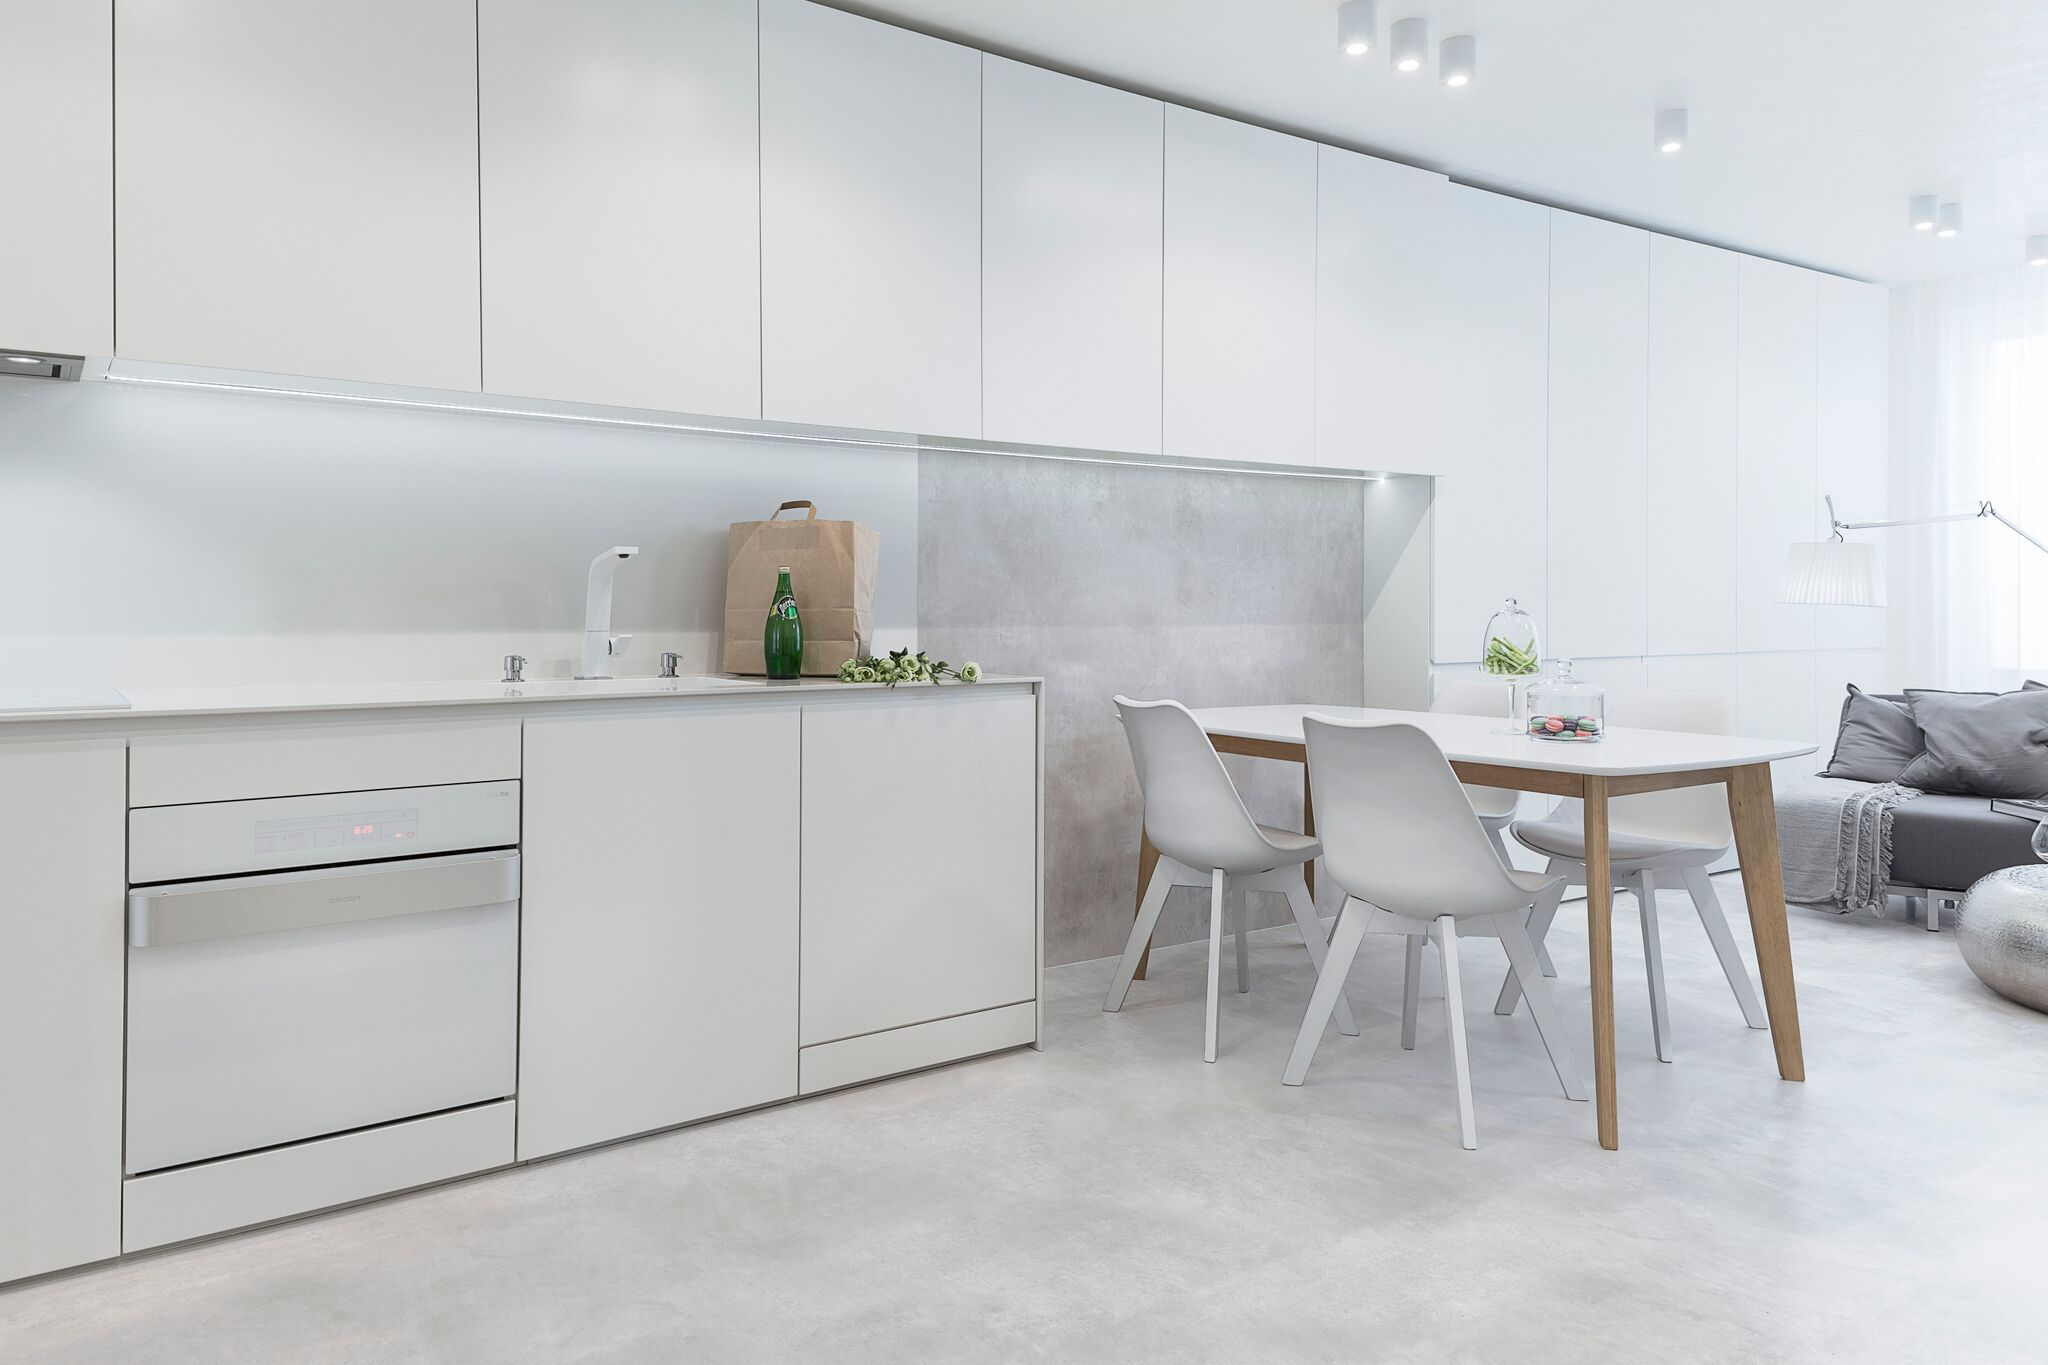 White kitchen-dining area